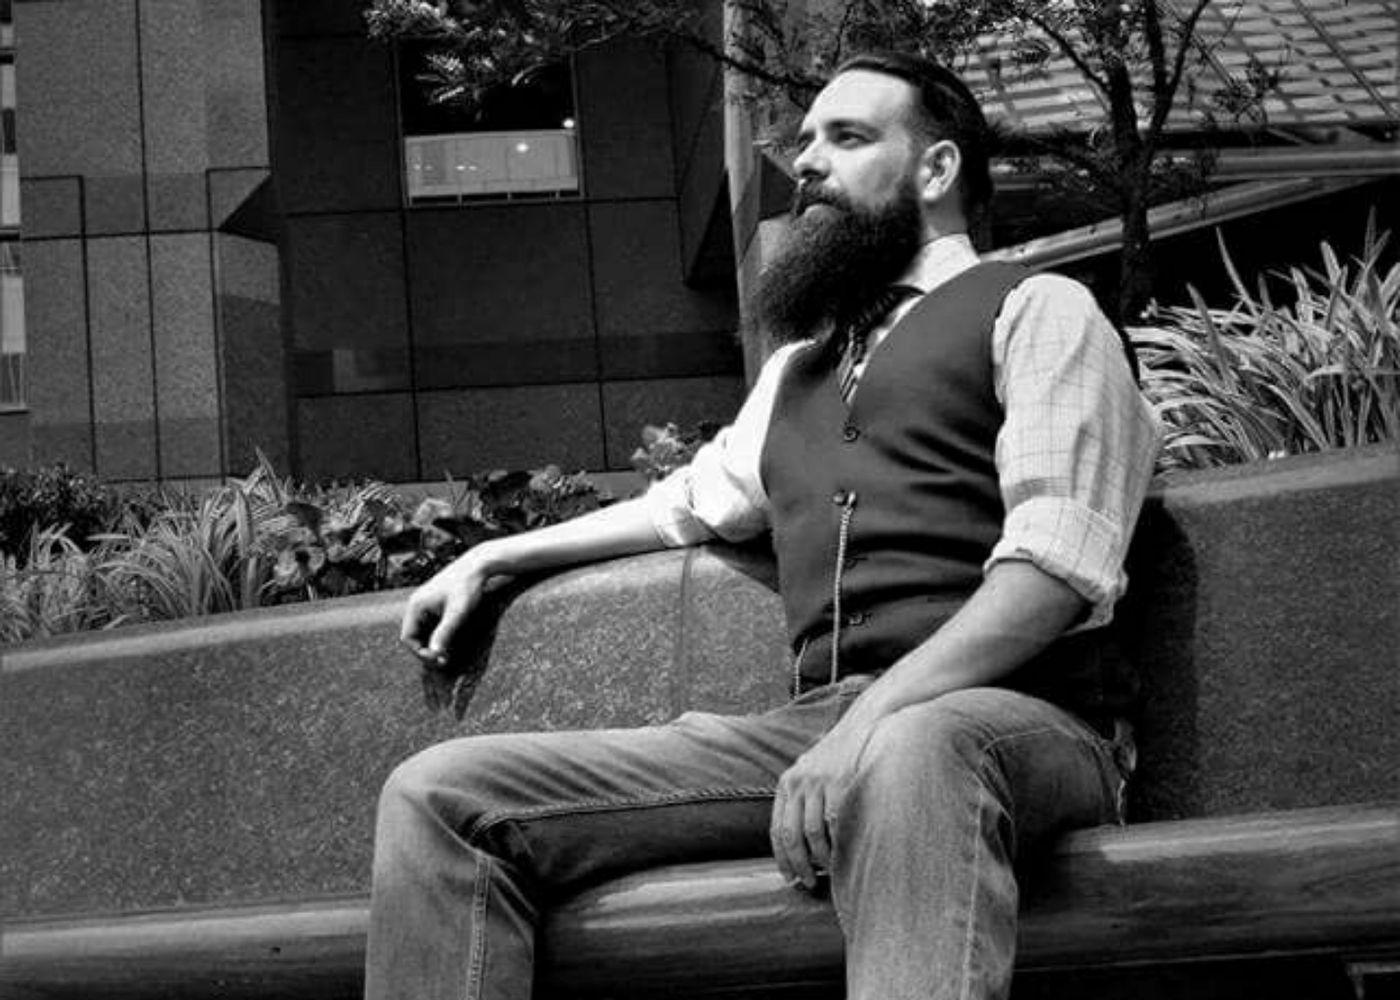 Facial hair tips from Philly's best bearded men